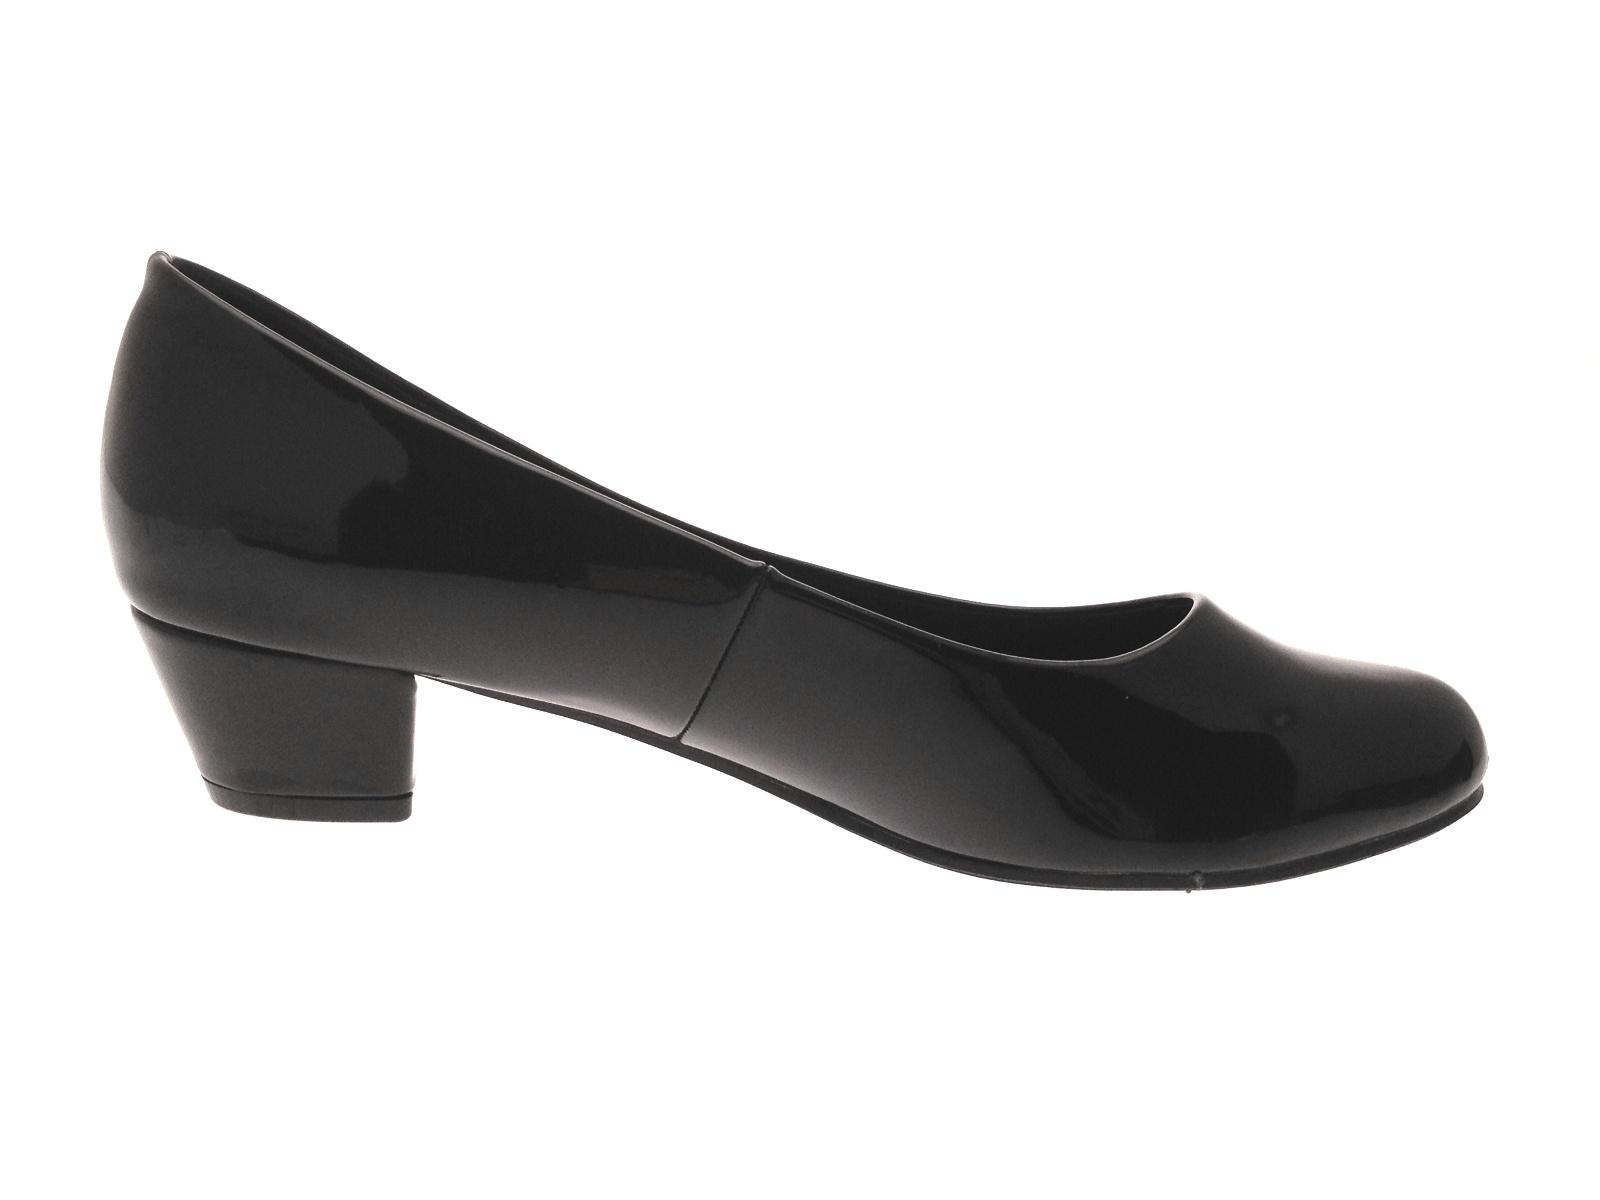 b74686d1cd6b6 Womens Low Block Heels Comfort Work Office Loafers Smart Court Shoes ...